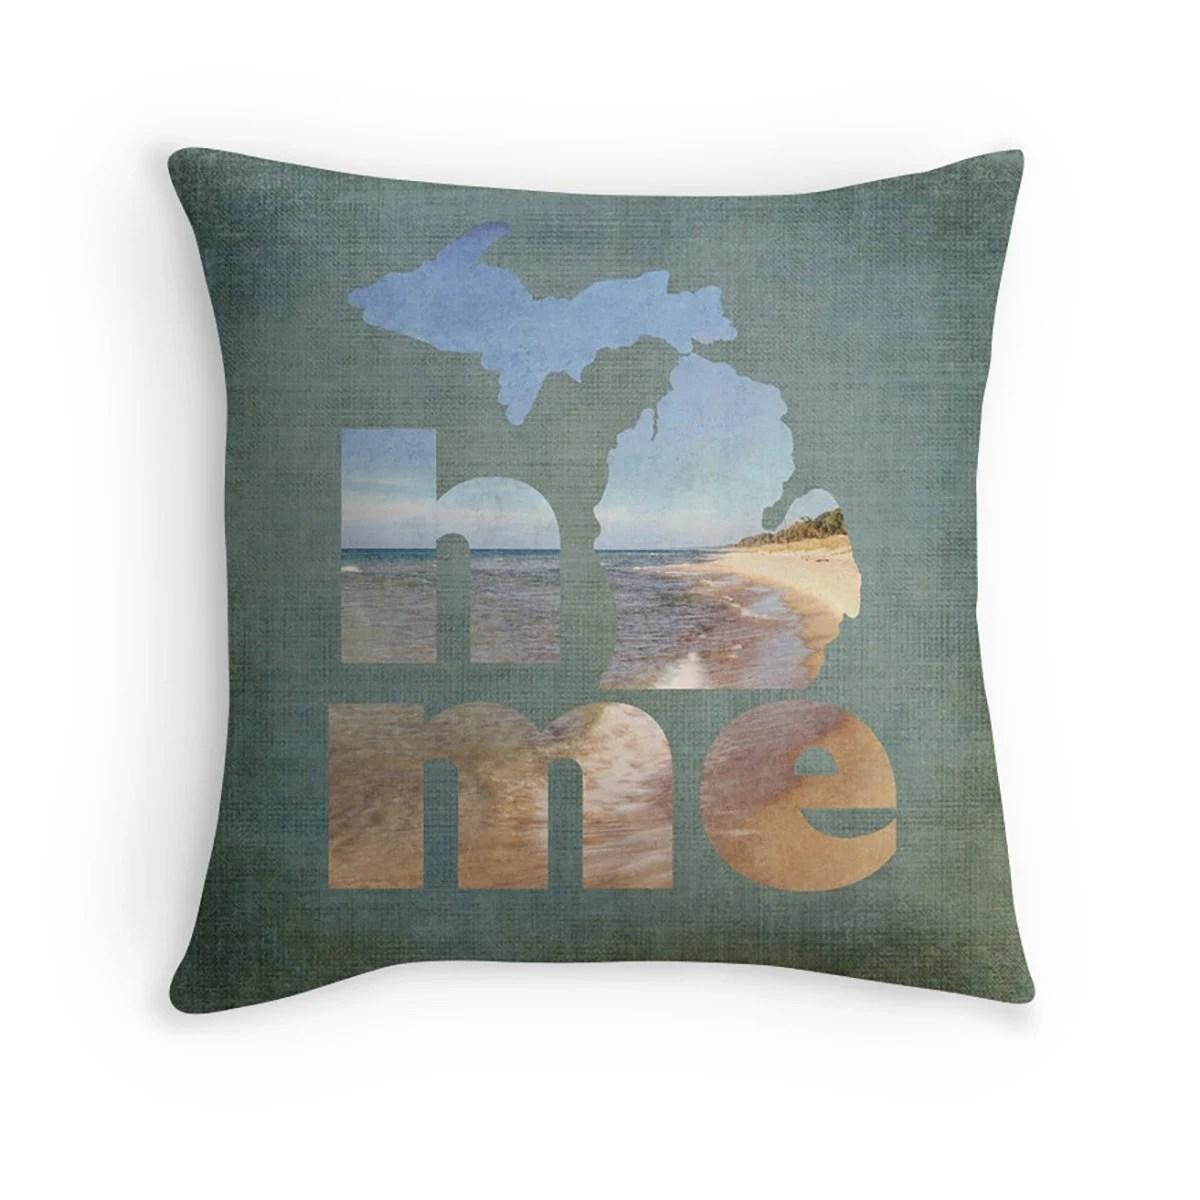 Michigan Home Pillow Cover Lake Michigan Pillow Cover